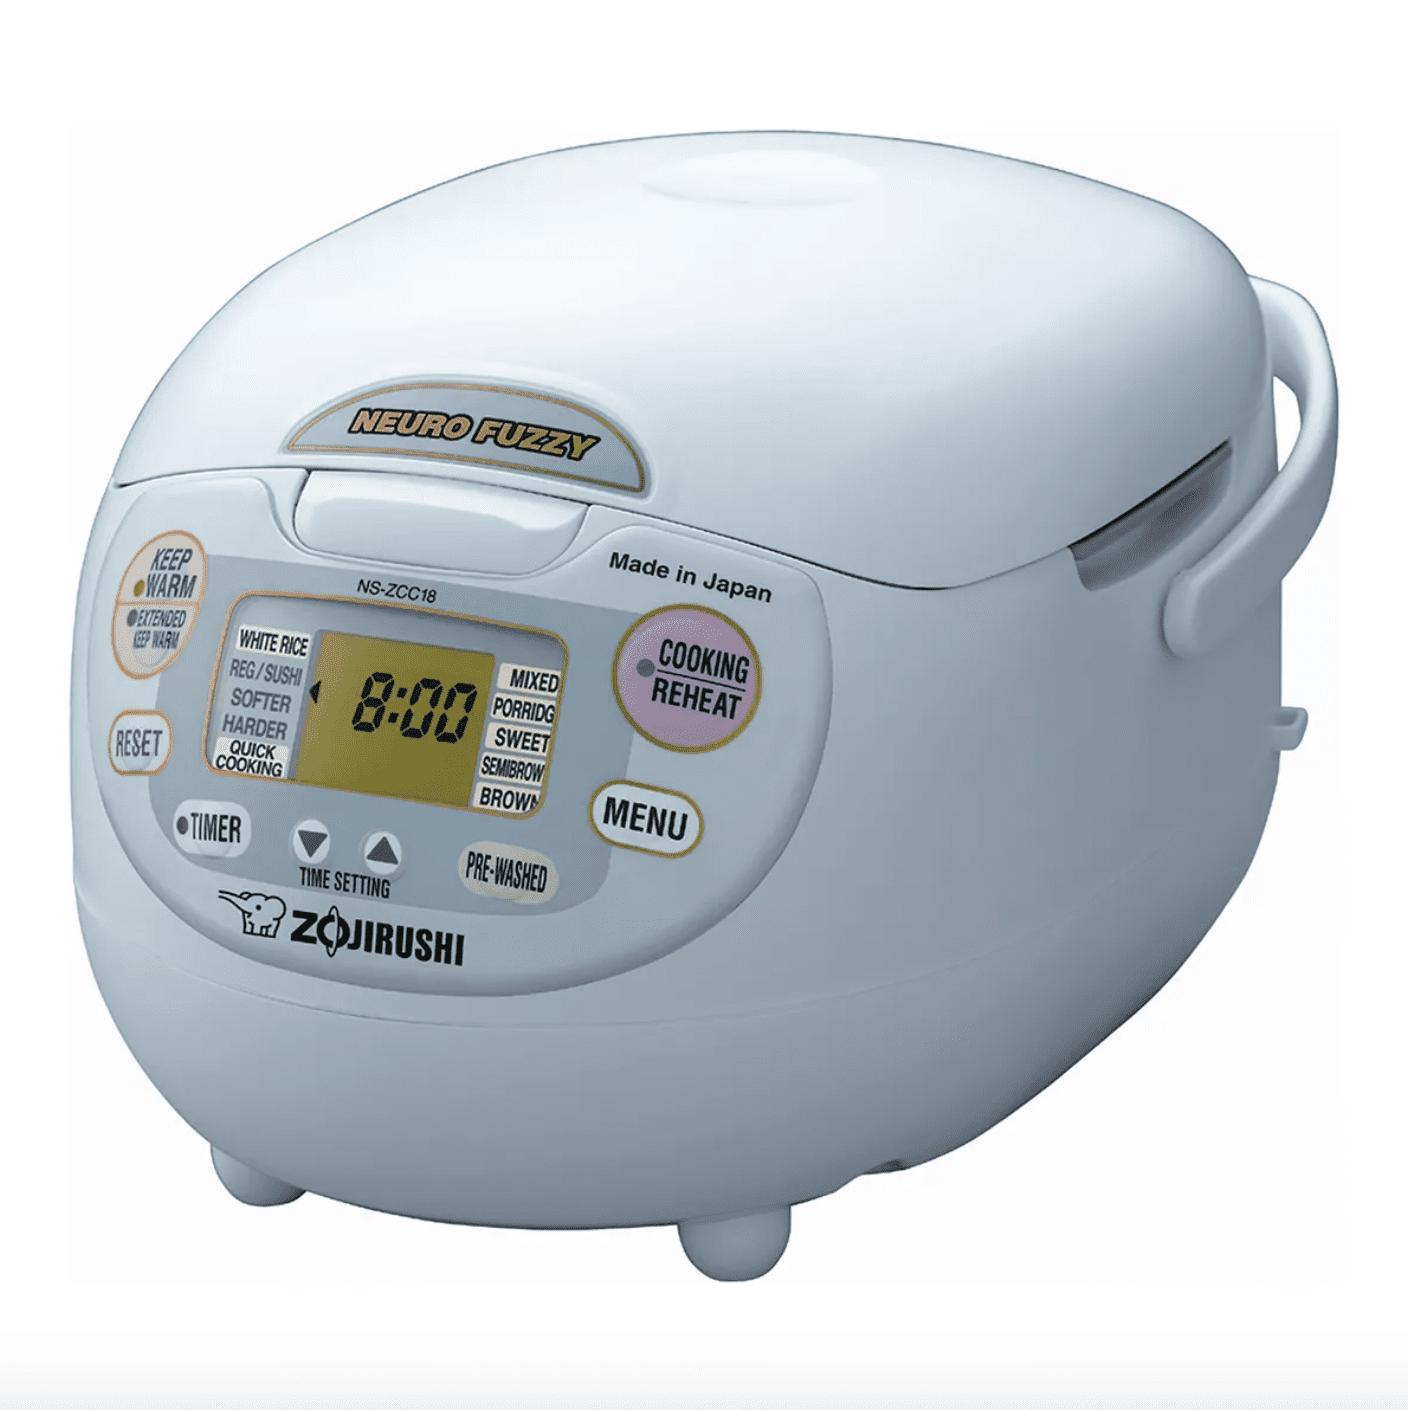 zojirushi-neuro-fuzzy-rice-cooker